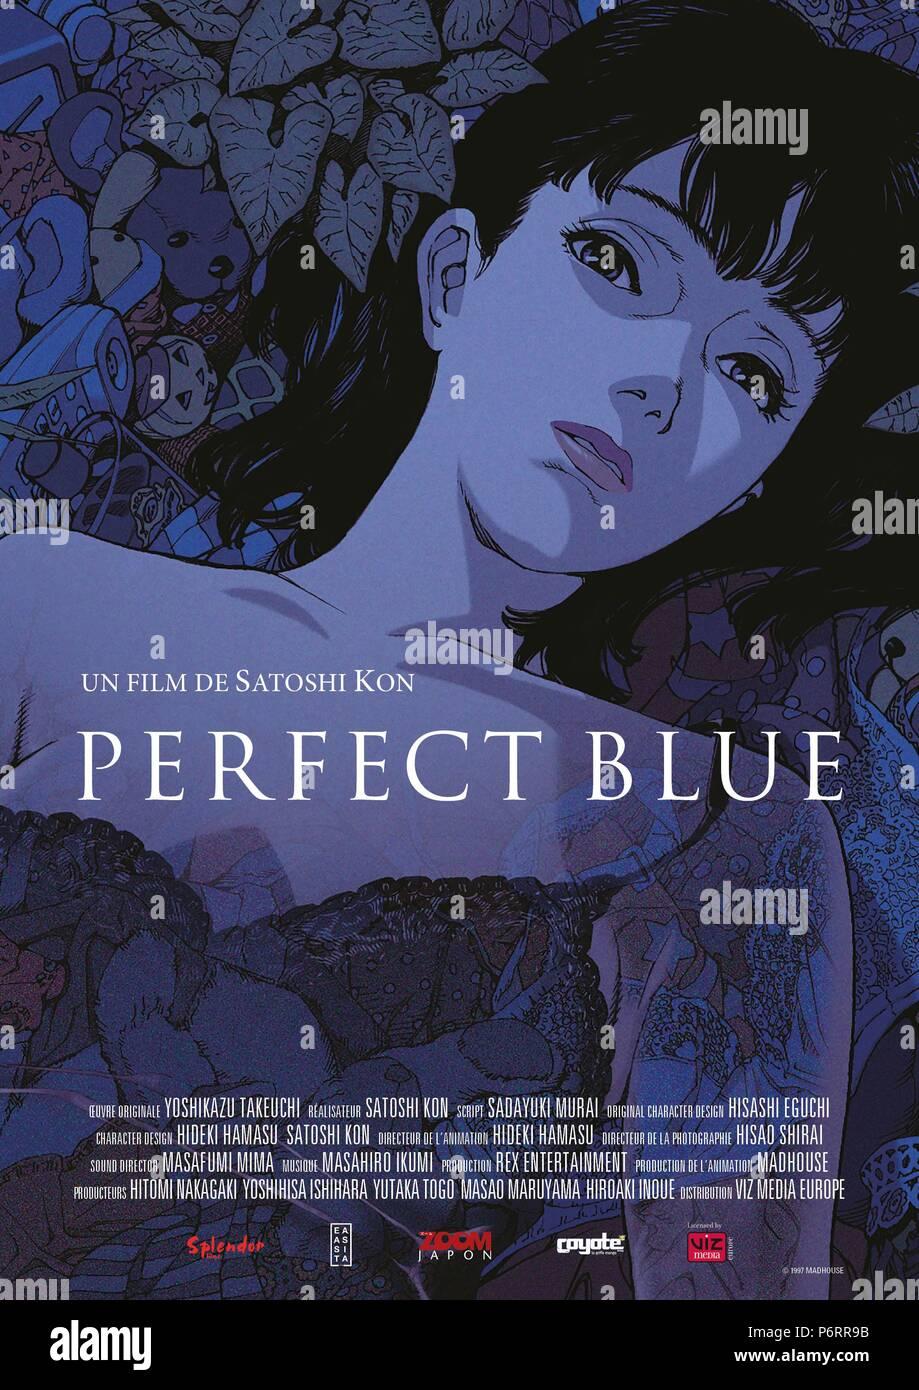 Perfect Blue Year 1997 Japan Director Satoshi Kon Animation Stock Photo Alamy